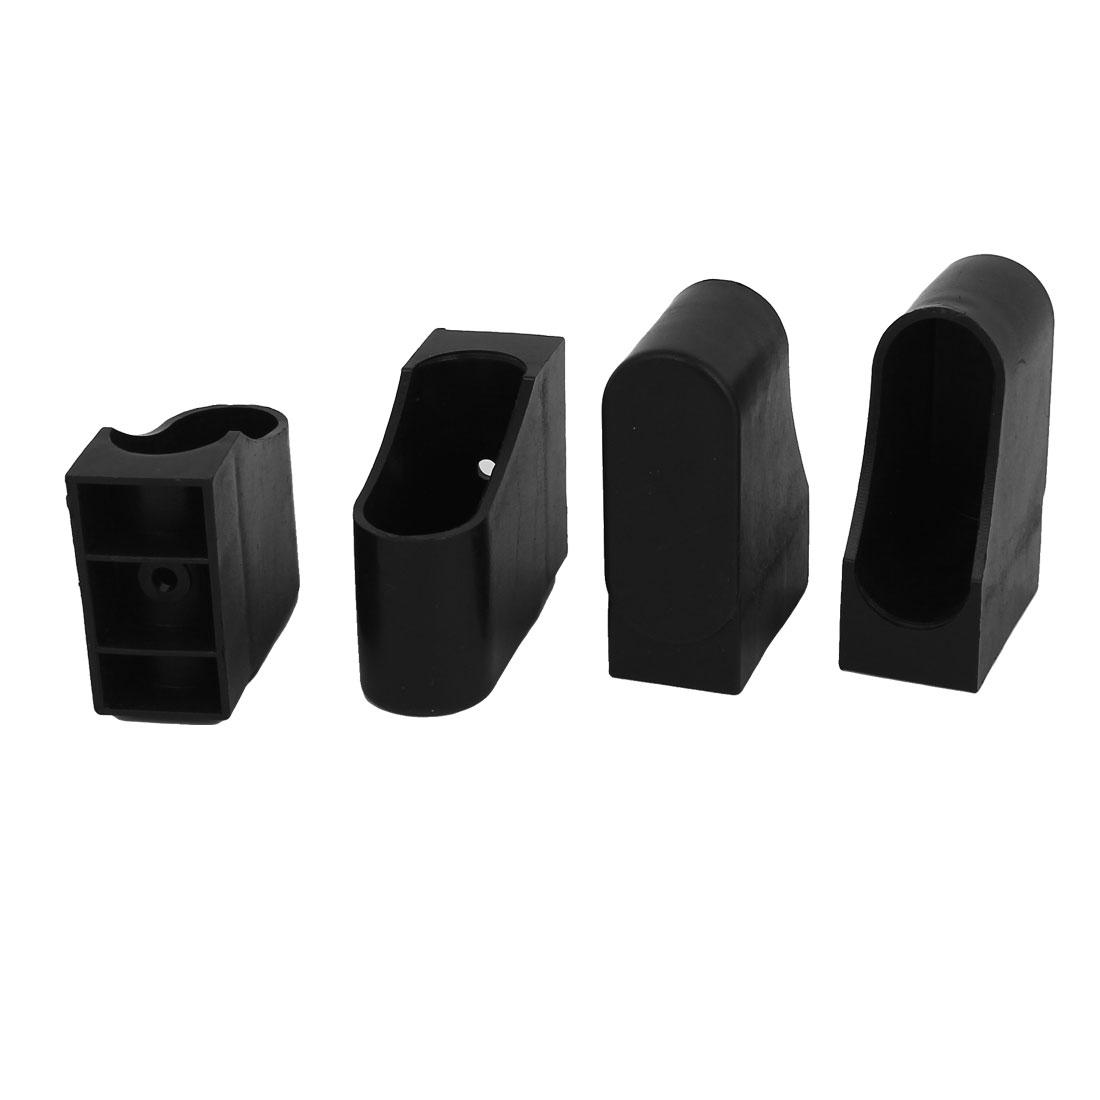 4Pcs Oval Shaped Plastic Furniture Foot Leg Corner Protector Pad 20mmx50mm Black